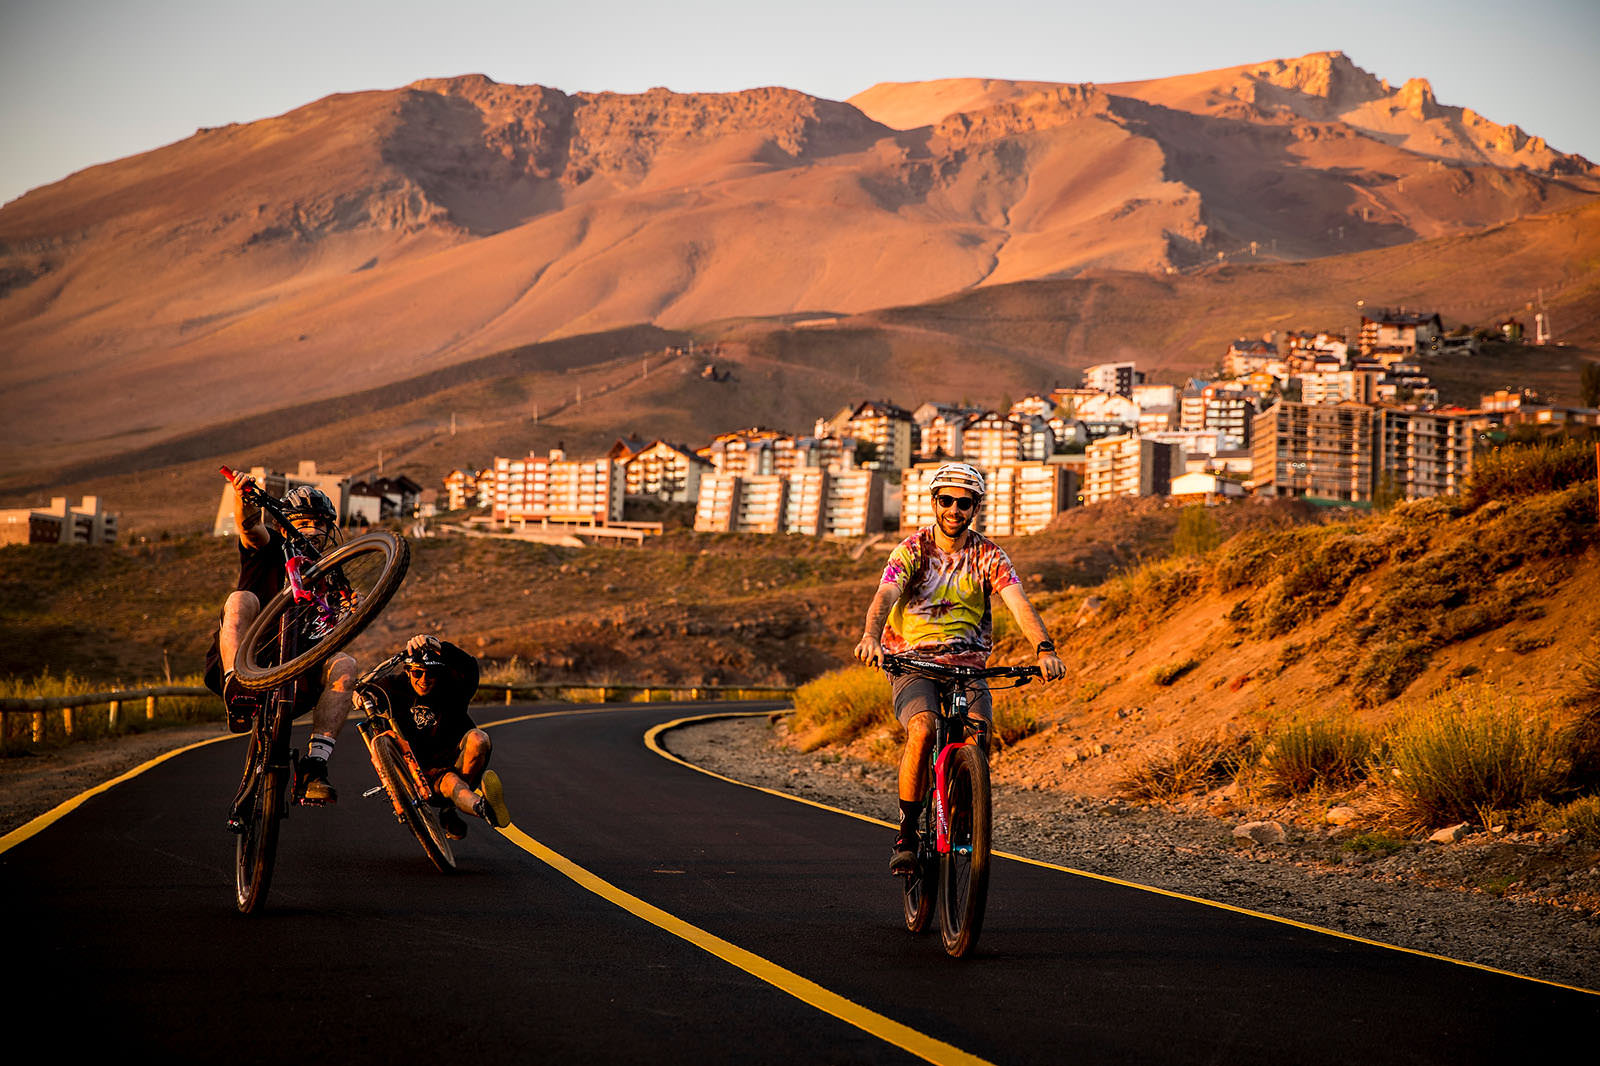 Santa Cruz Bicycles - Iago Garay, Josh Lewis, and Josh Bryceland in Chile